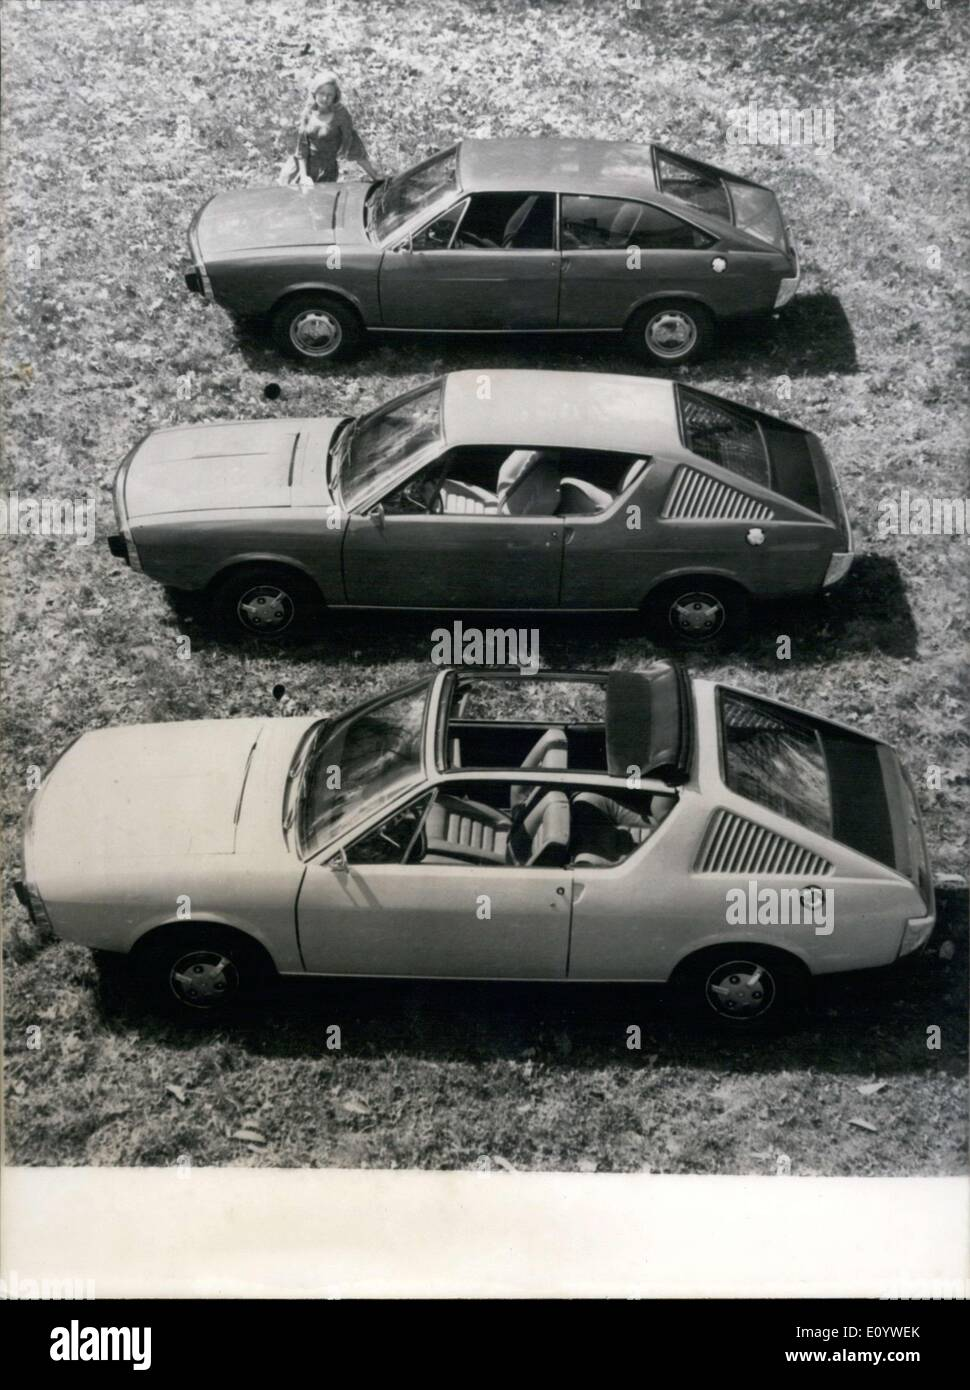 Renault Convertible Stockfotos & Renault Convertible Bilder - Alamy